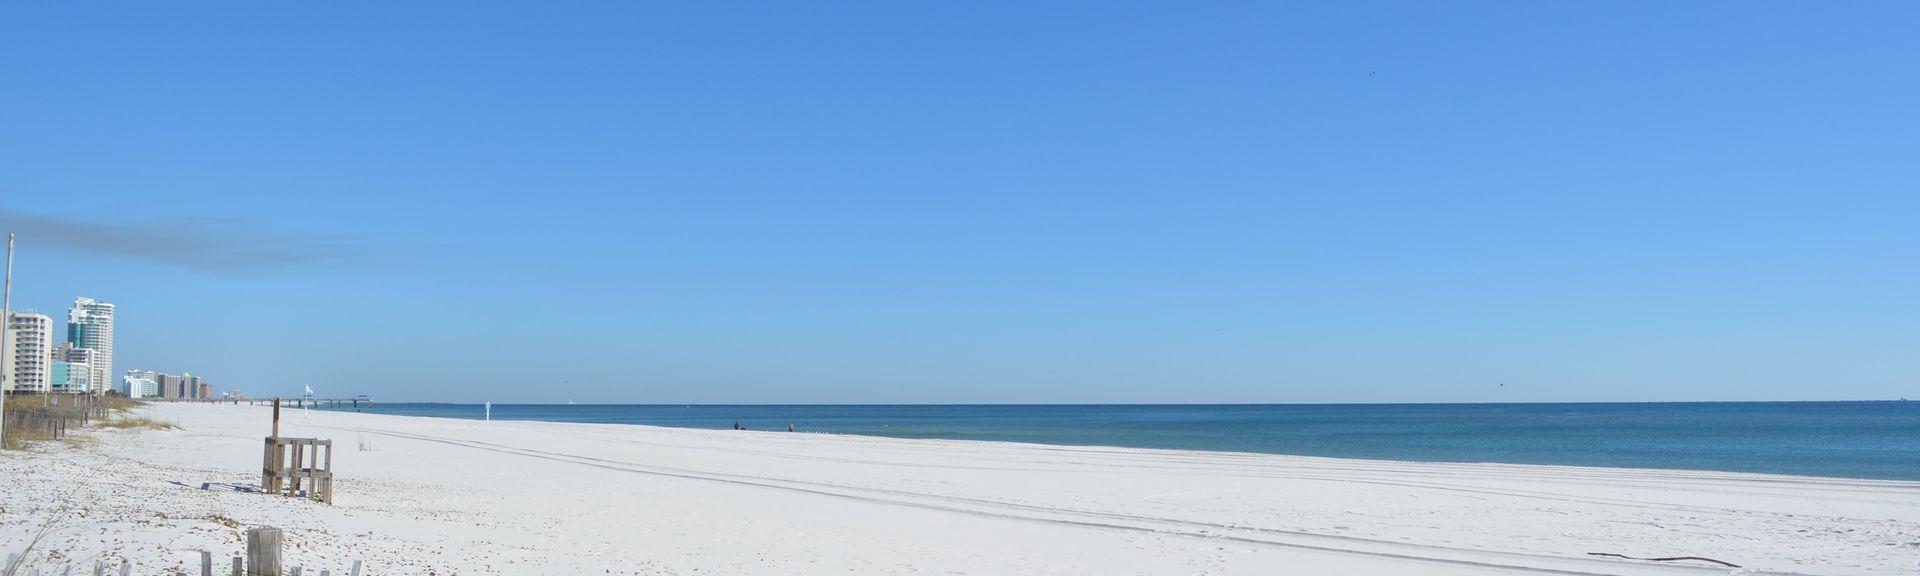 The Enclave, Orange Beach, AL, USA